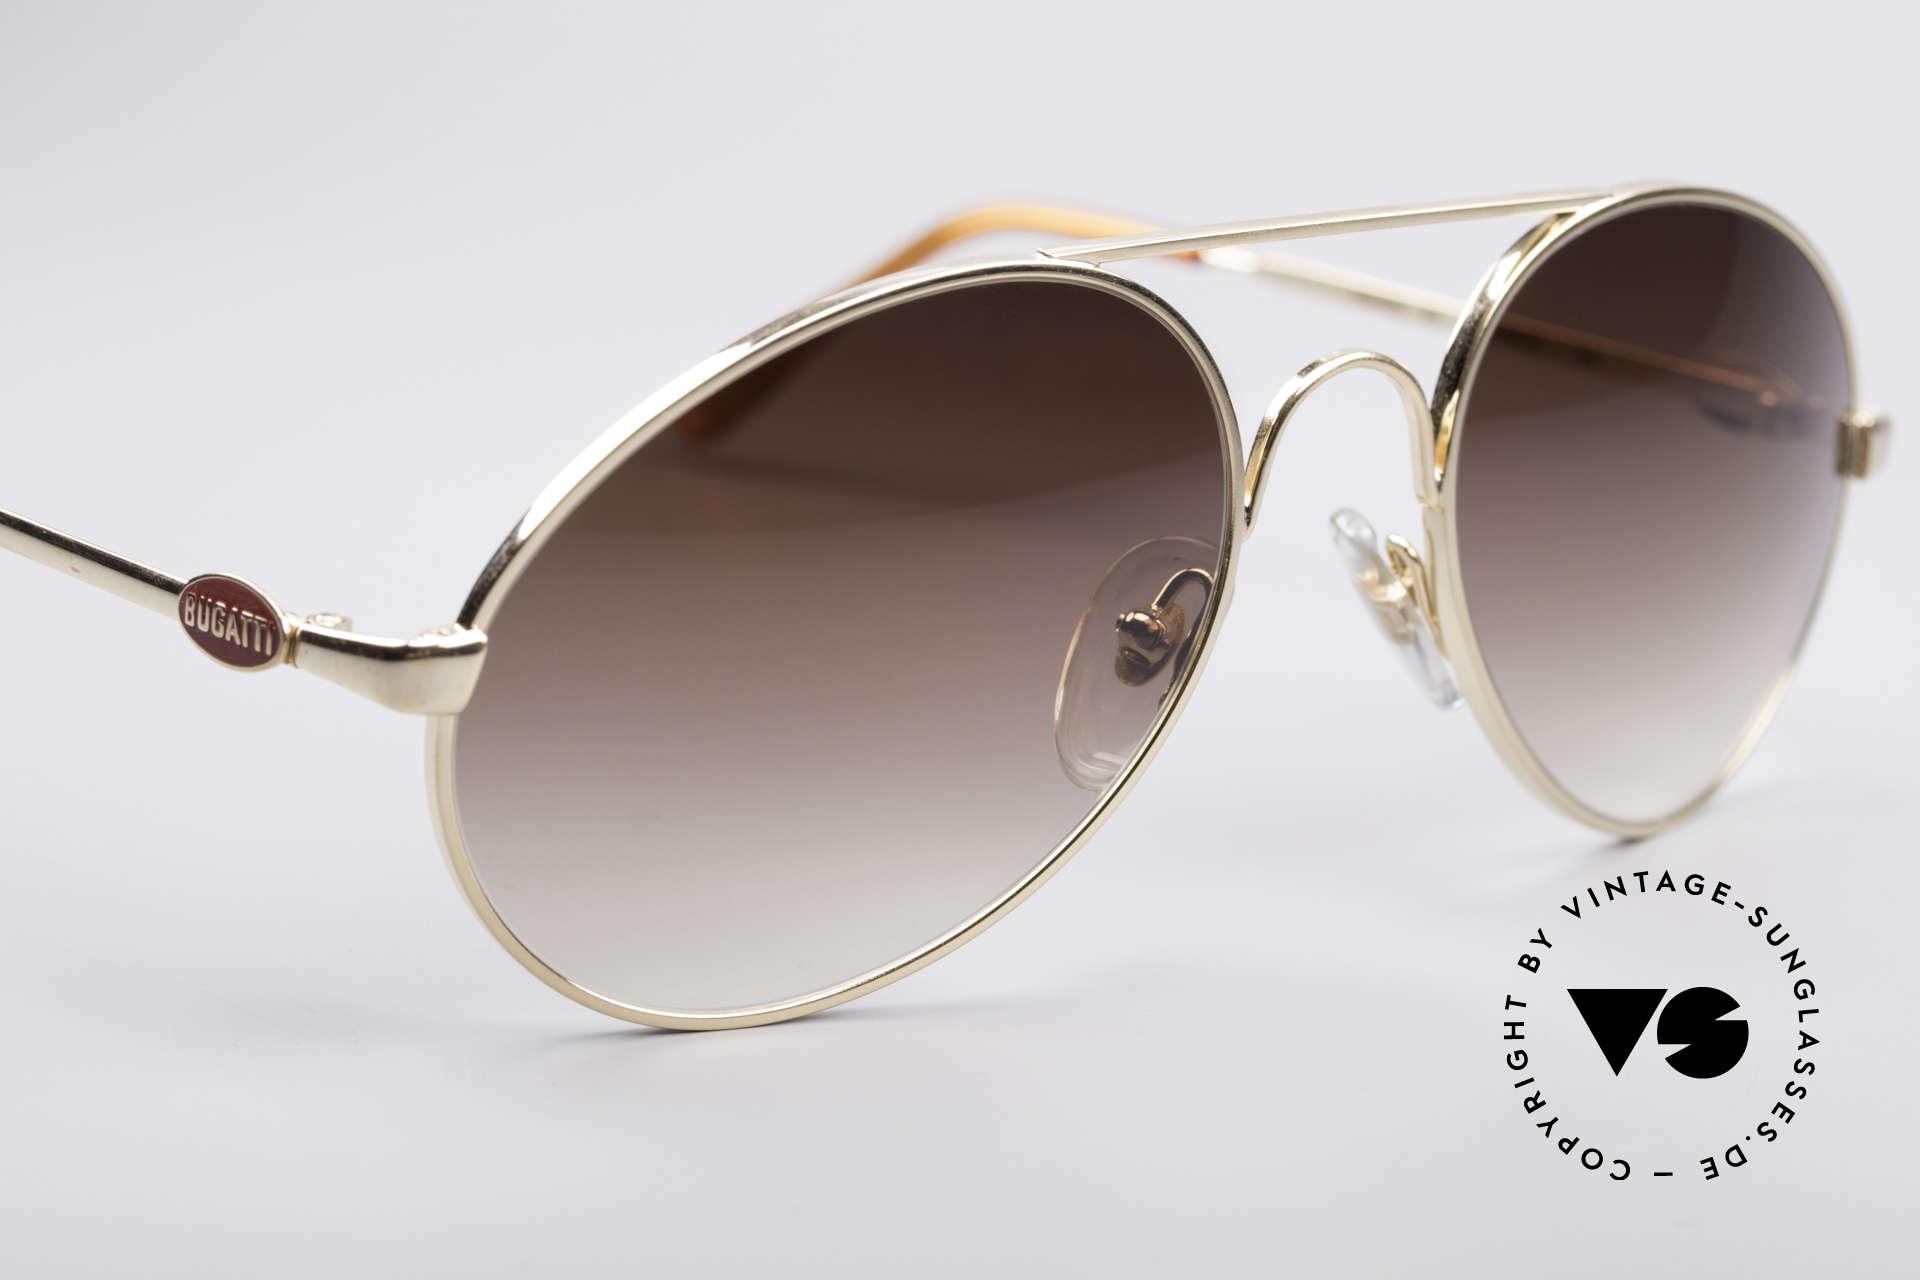 Bugatti 65986 Luxury 80's Sunglasses, unworn (like all our vintage Bugatti eyewear), Made for Men